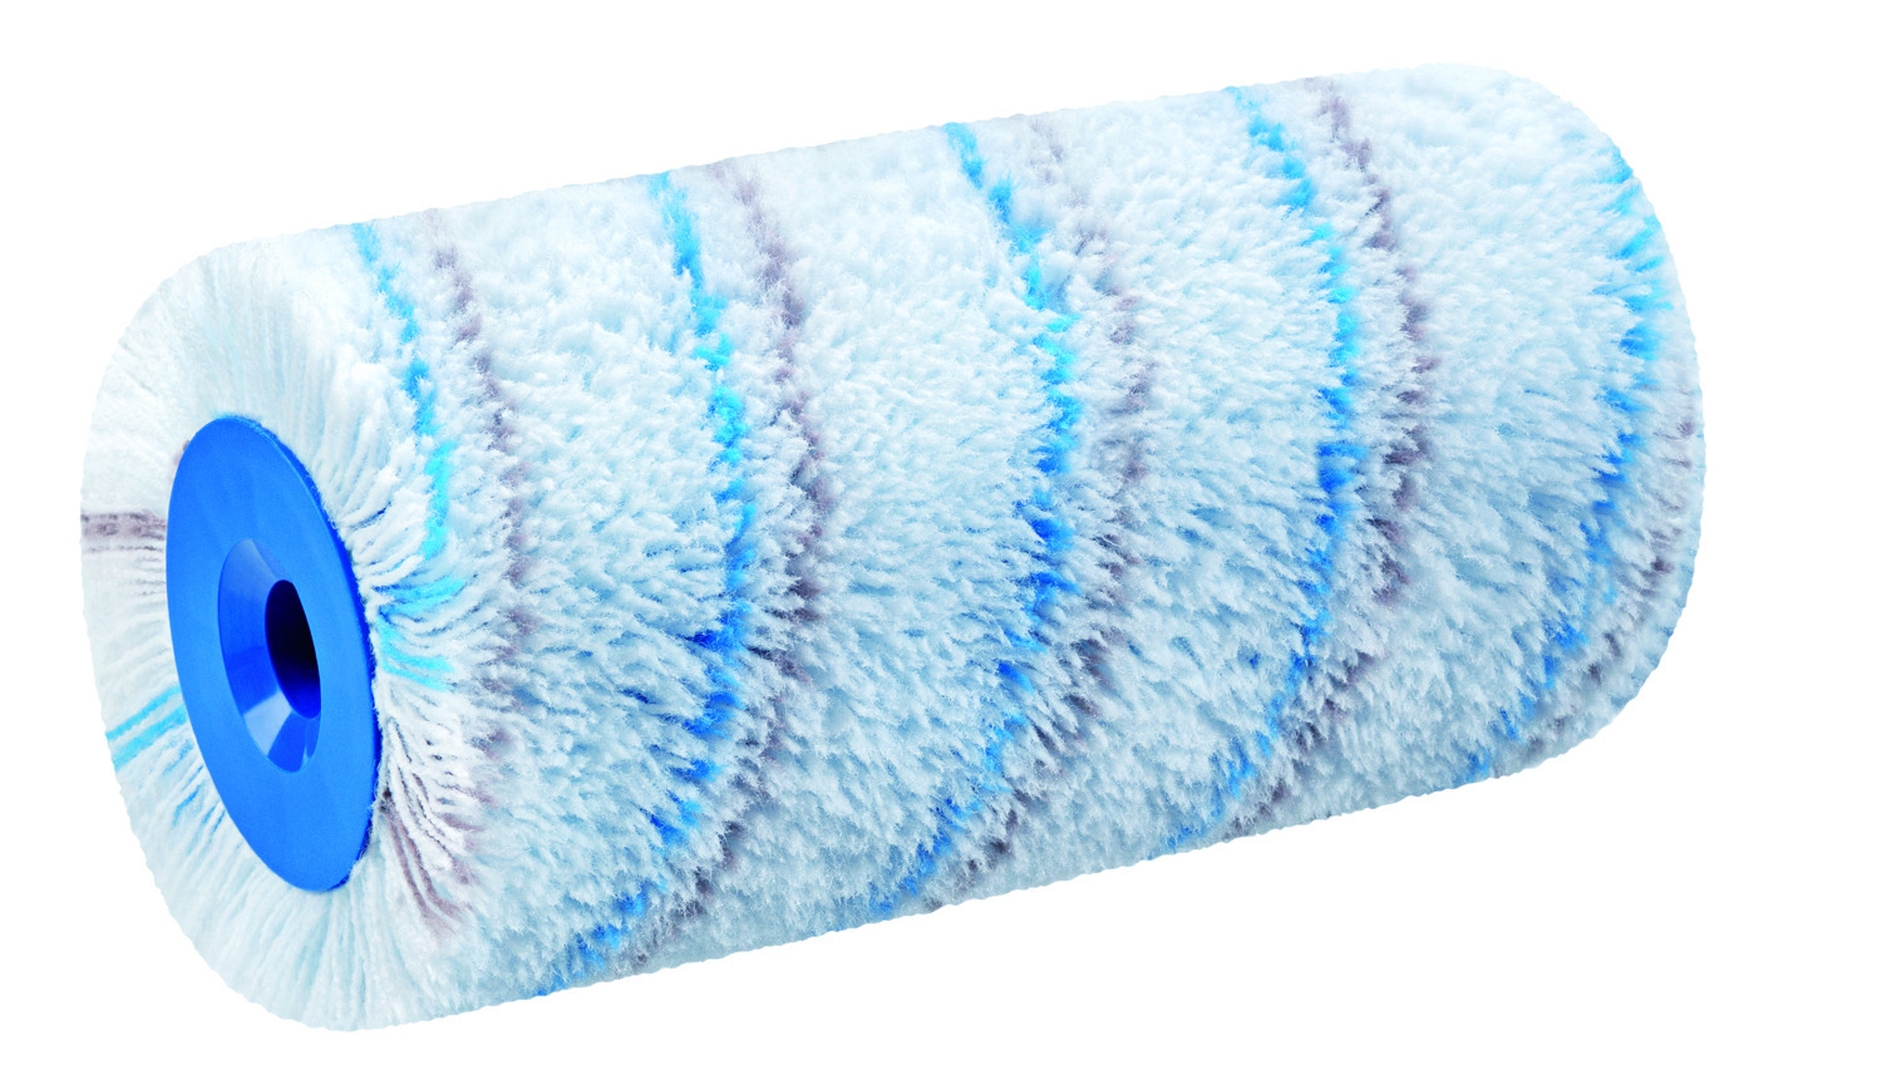 STORCH Walze, 18 cm, Polyamid, Multicolor, Blaugraufaden, SolidXL, Kern-Ø 60